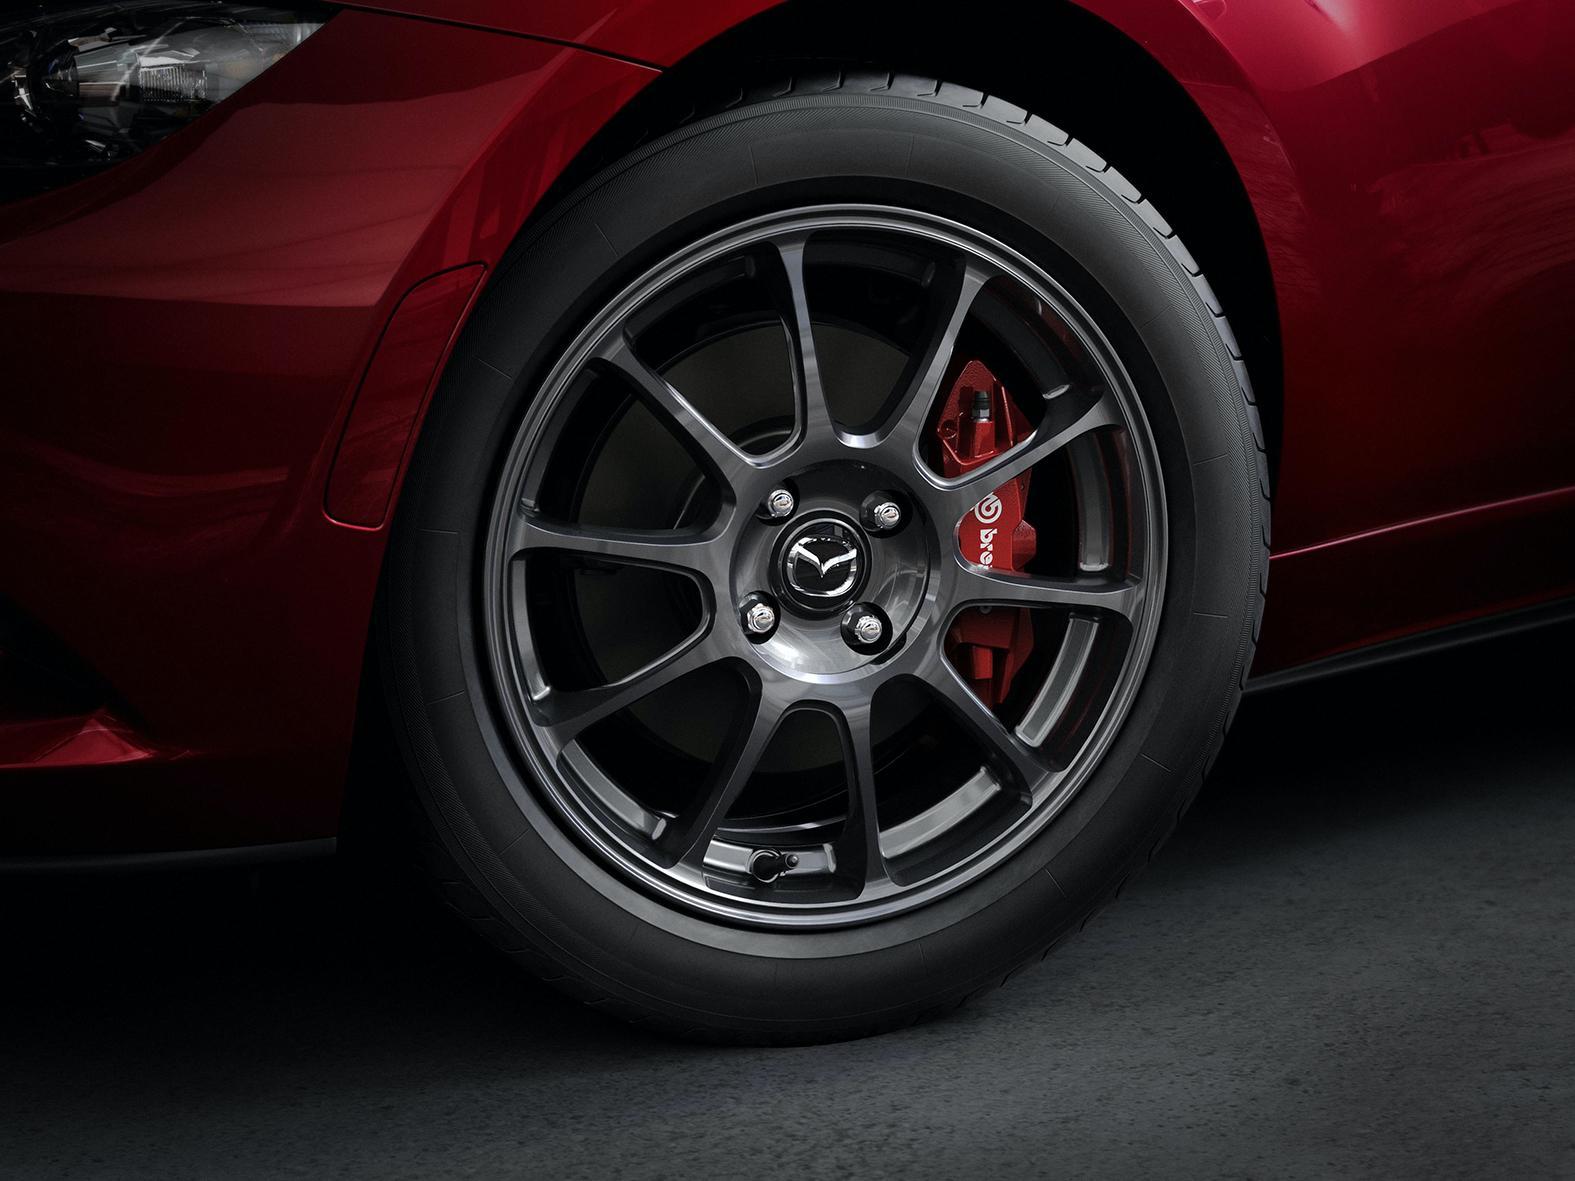 Mazda-MX-5-and-CX-5-2020-13